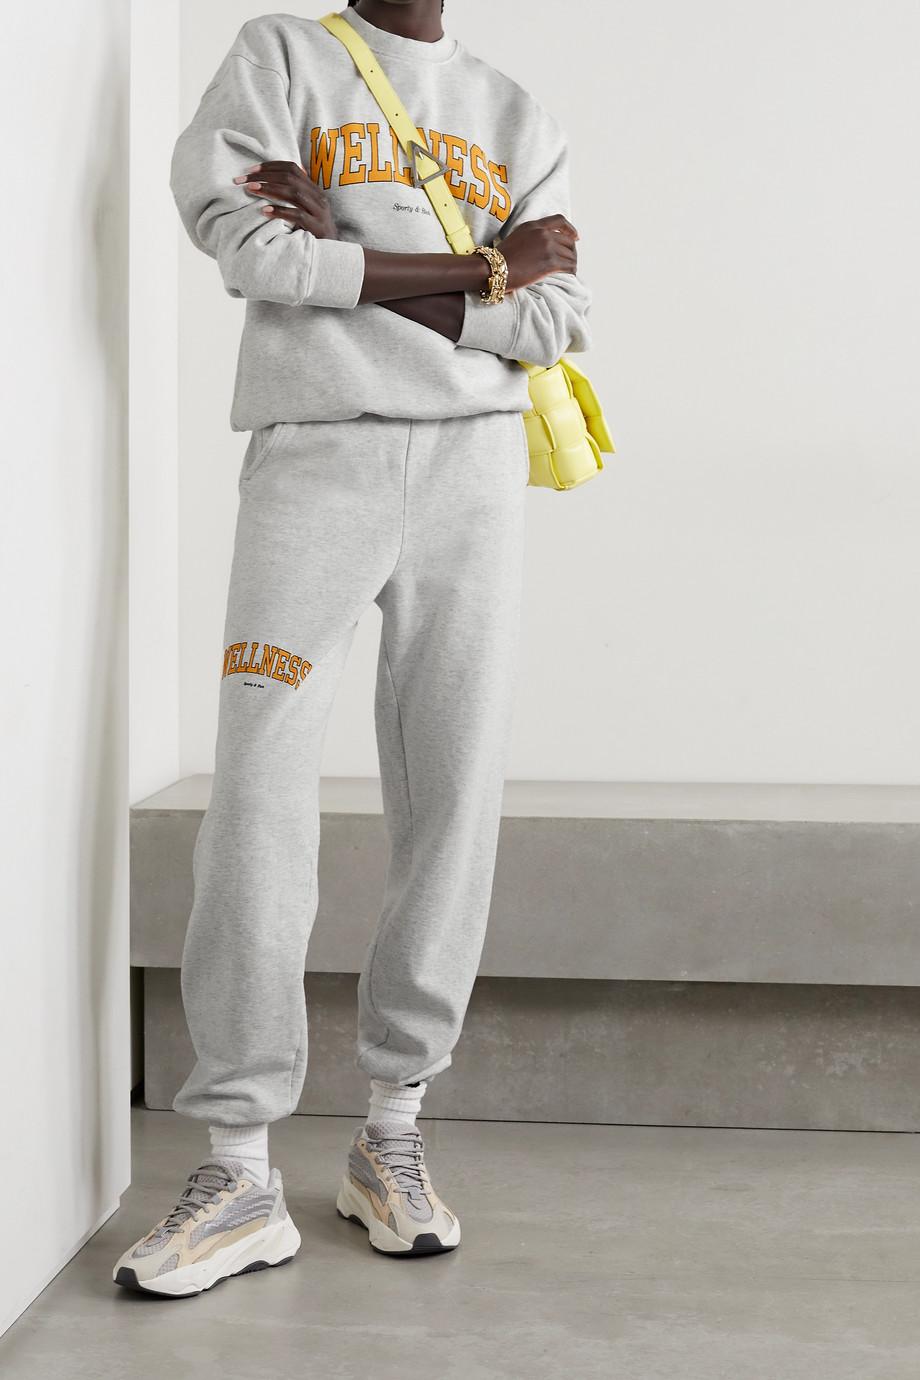 Sporty & Rich Wellness Ivy Jogginghose aus meliertem Baumwoll-Jersey mit Print